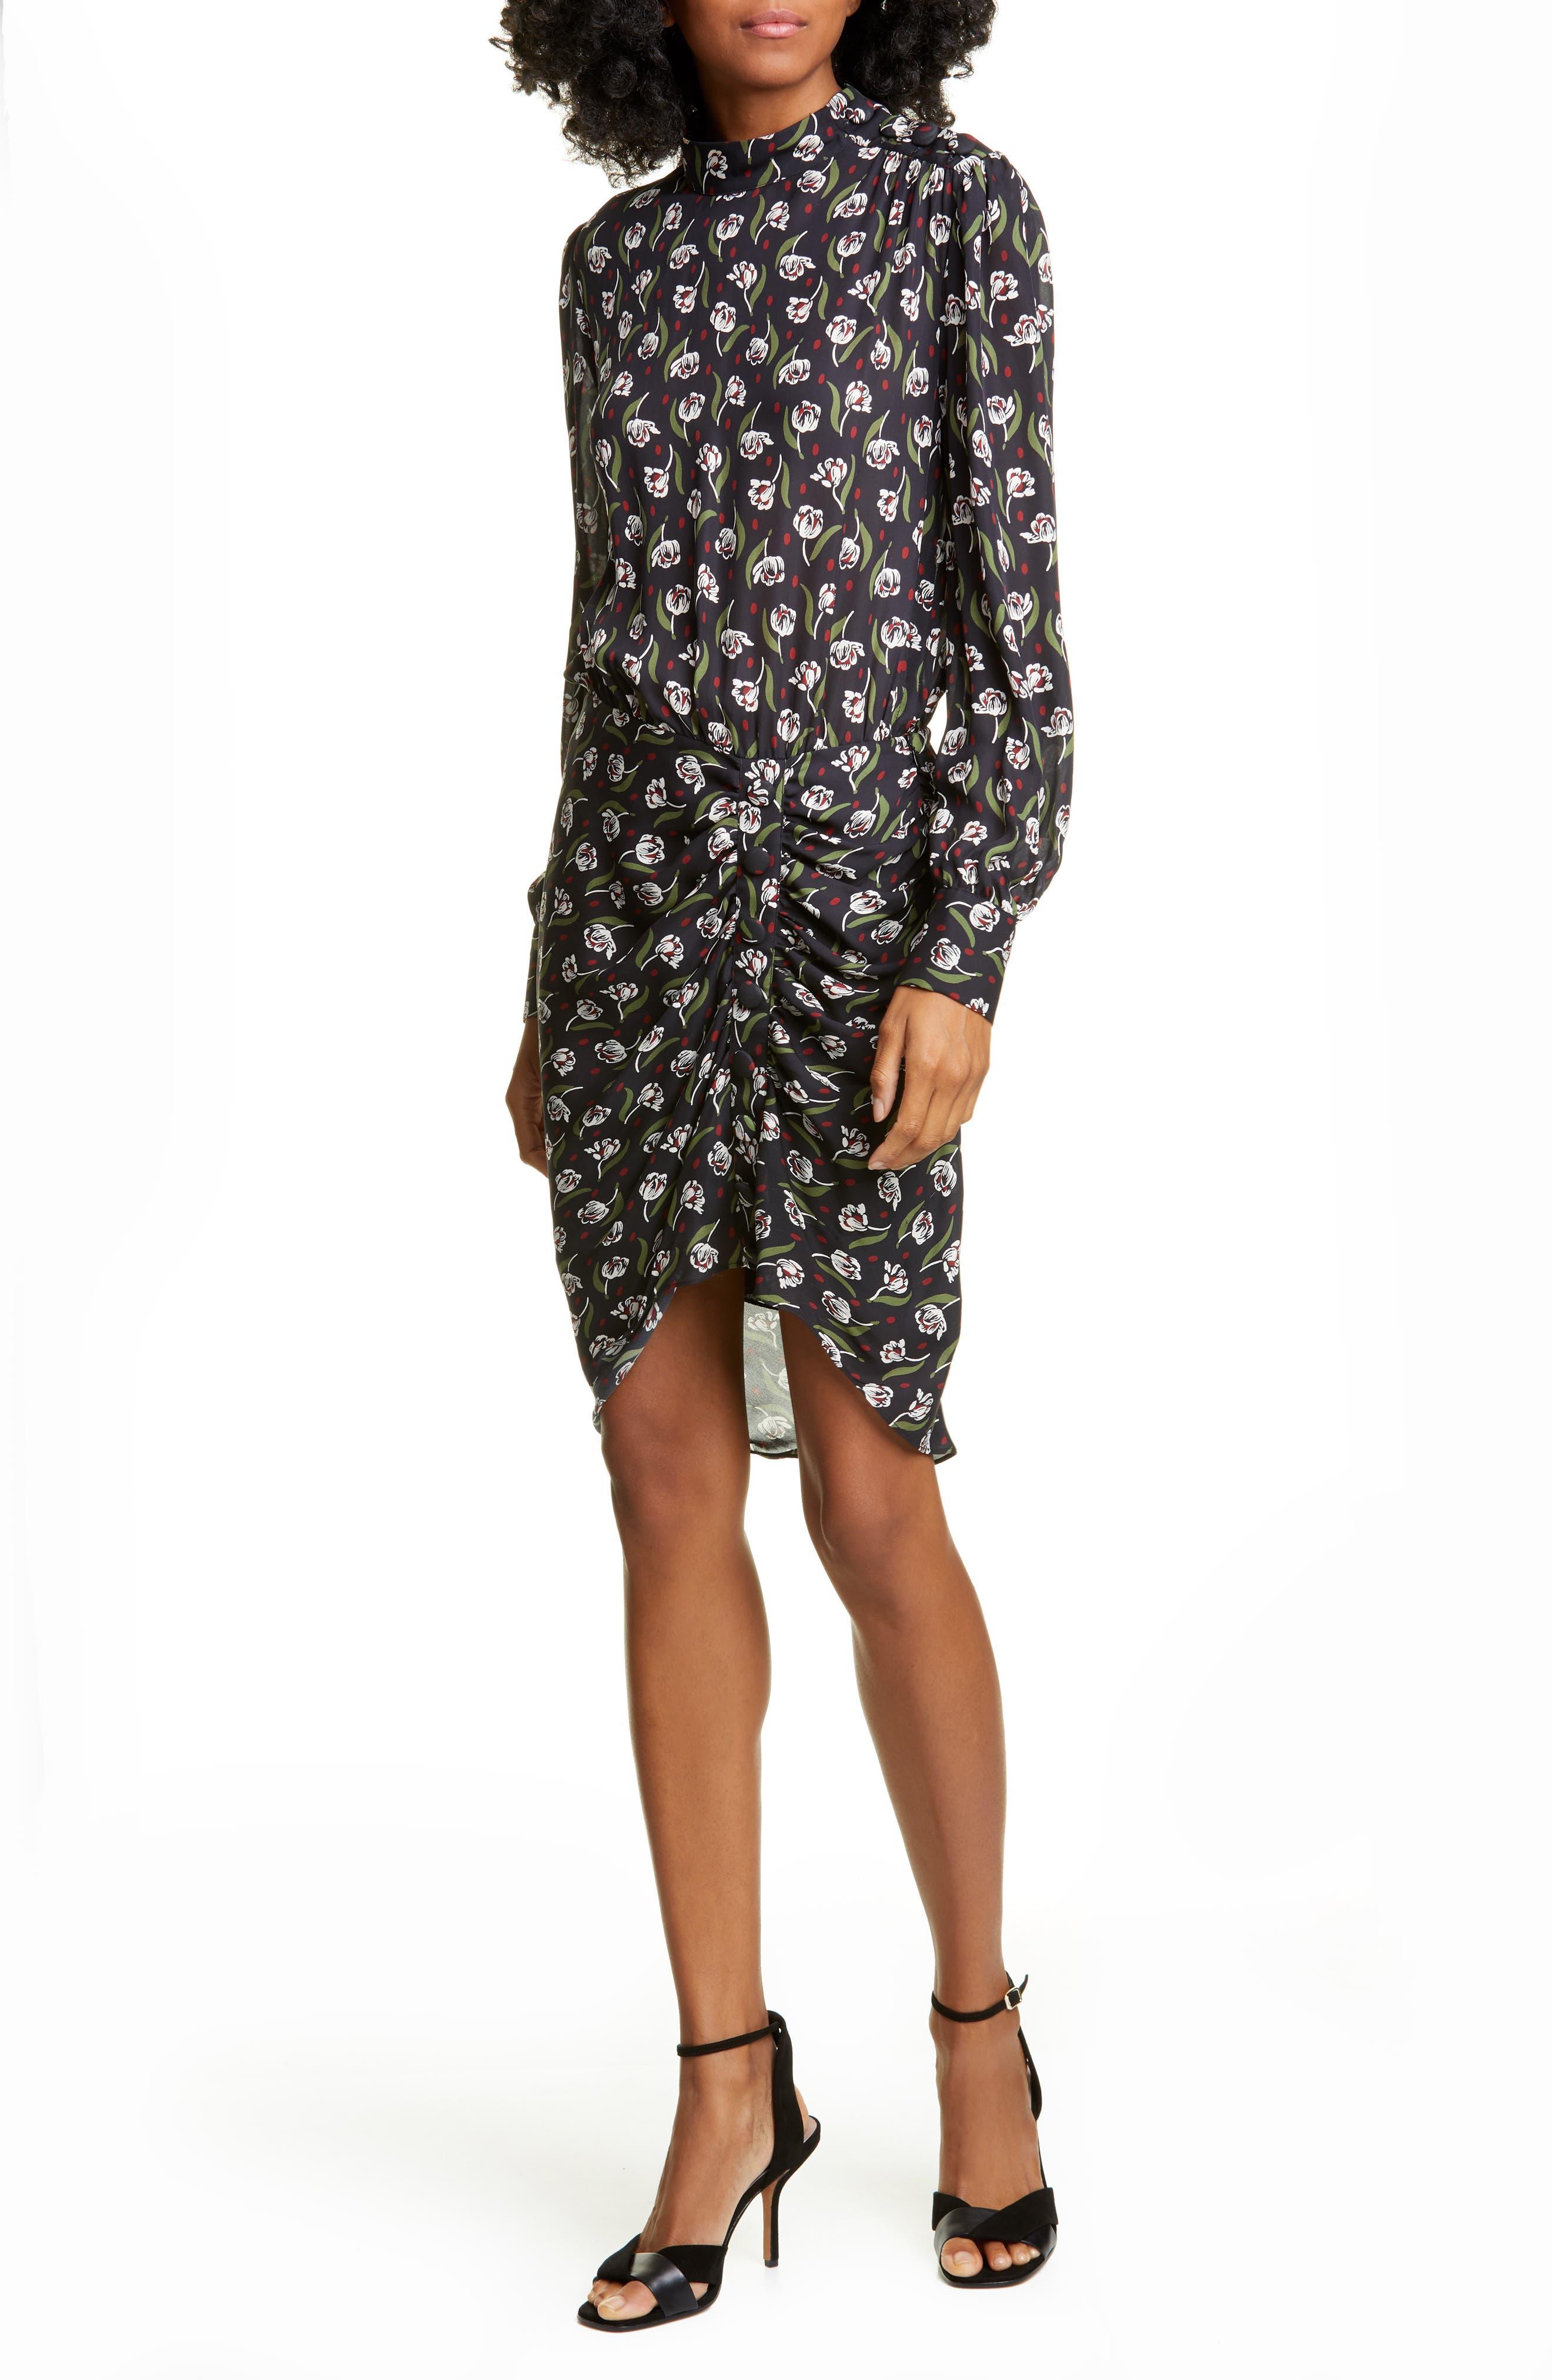 Veronica Beard Dresses Cadence Long Sleeve Stretch Silk Dress